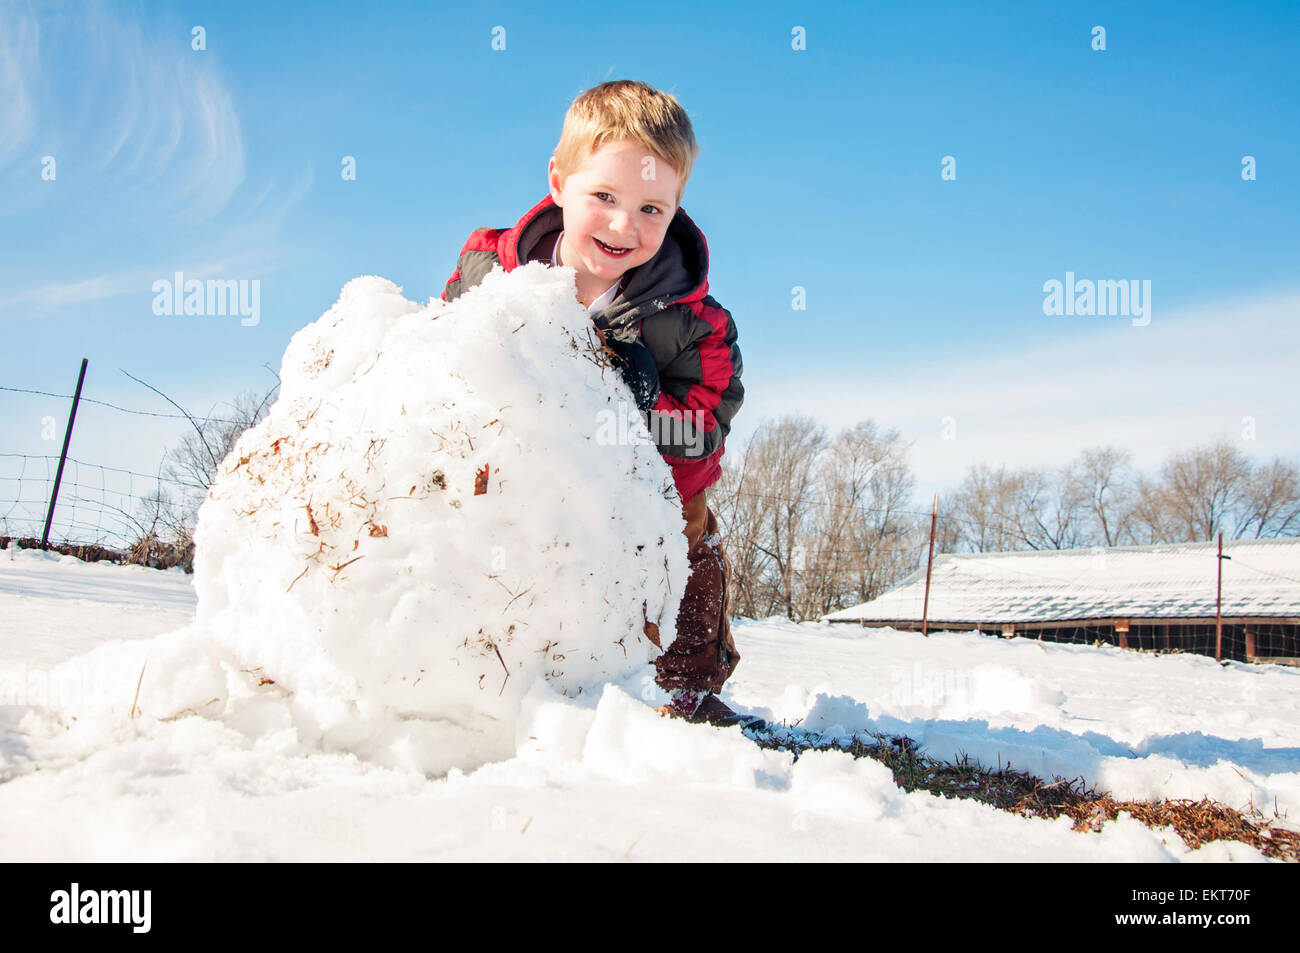 Kind rollt großen Schneeball um Schneemann Stockbild